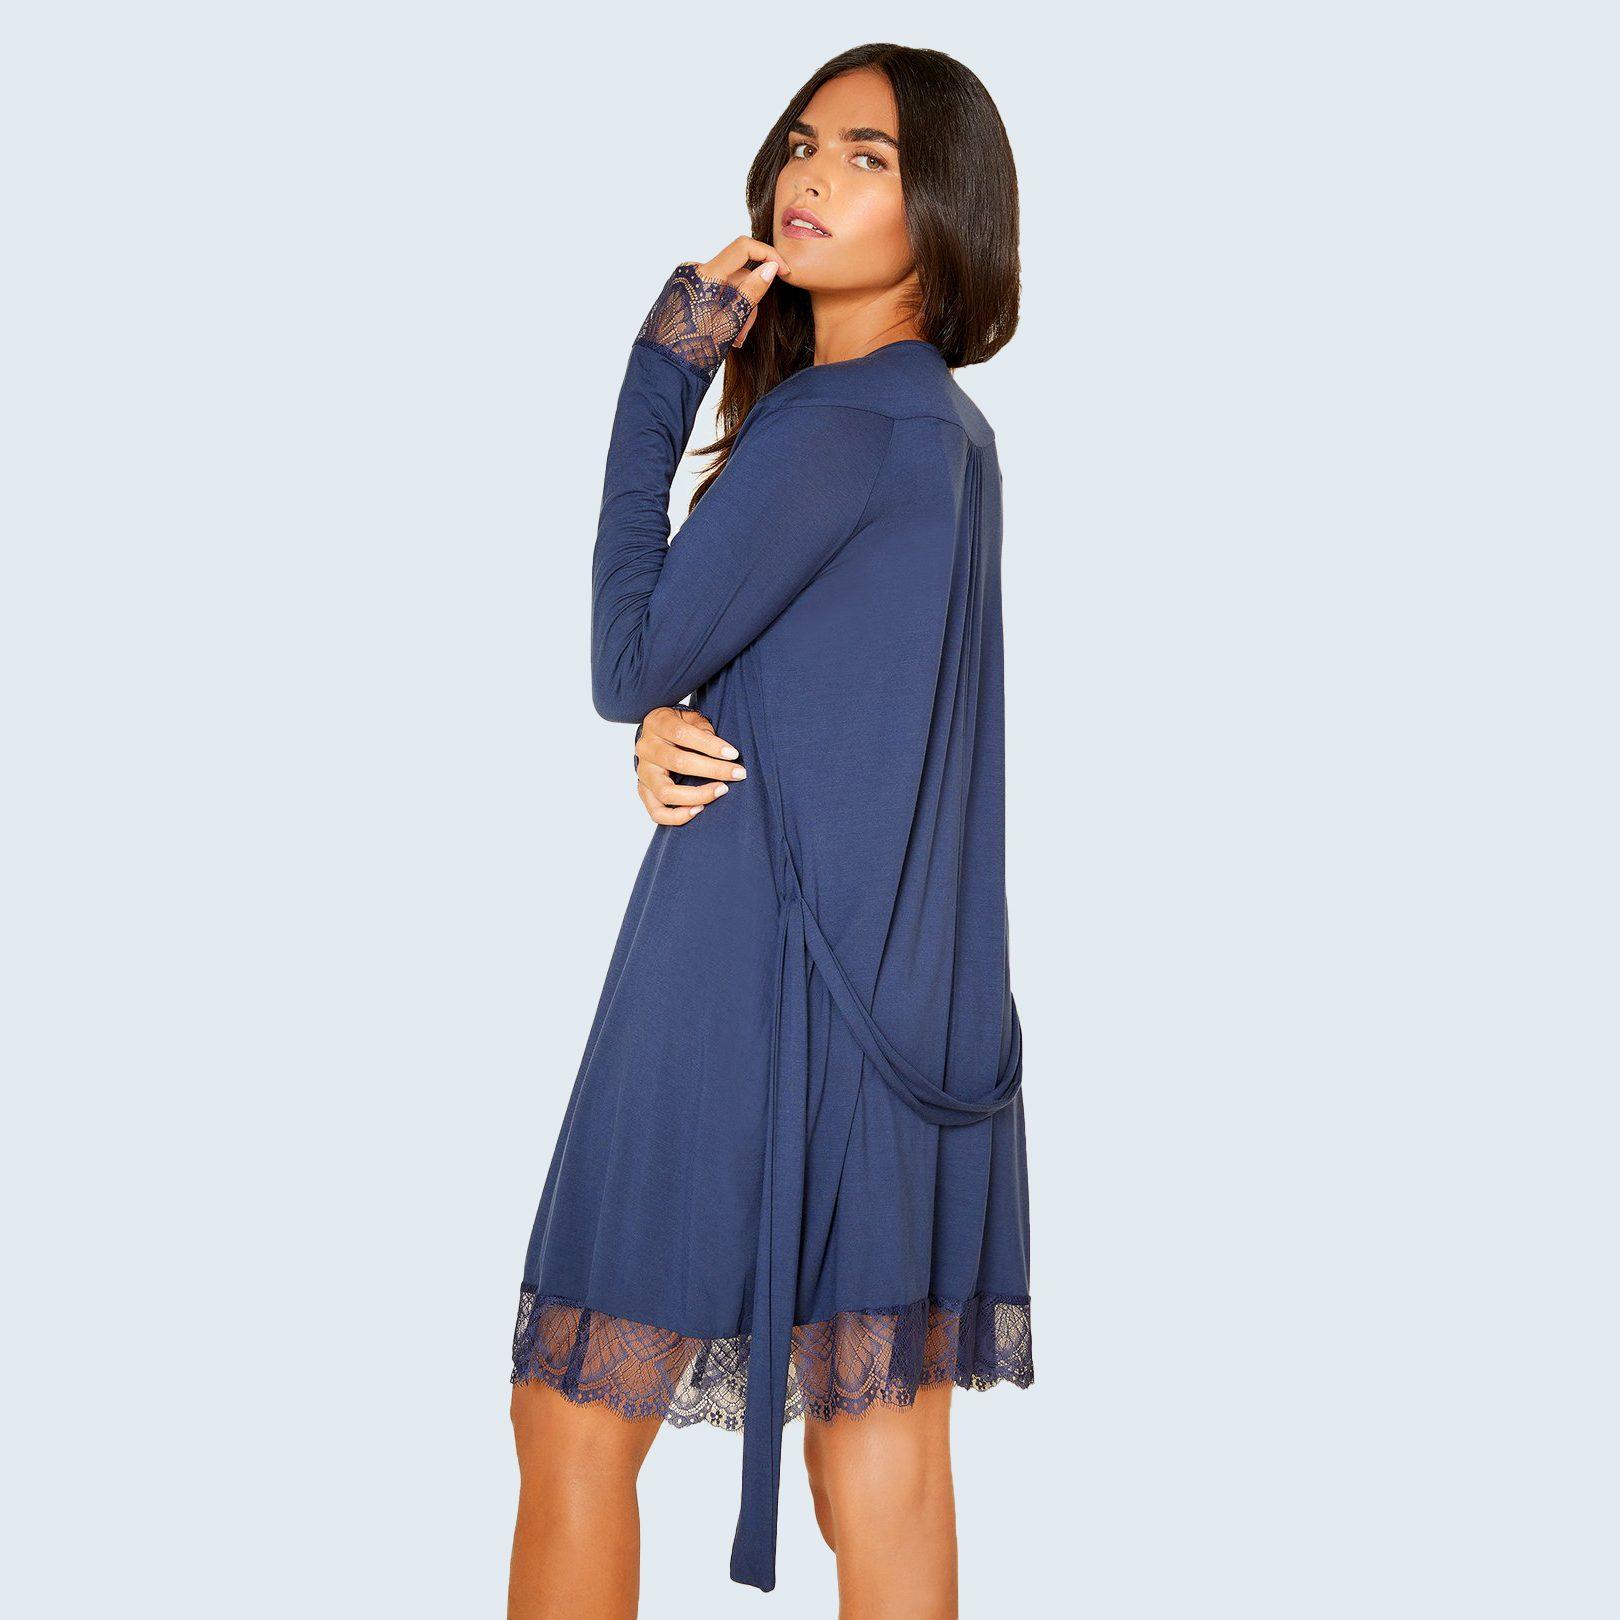 Cheyenne Sleep Wear Long Sleeve Robe from Cosabella